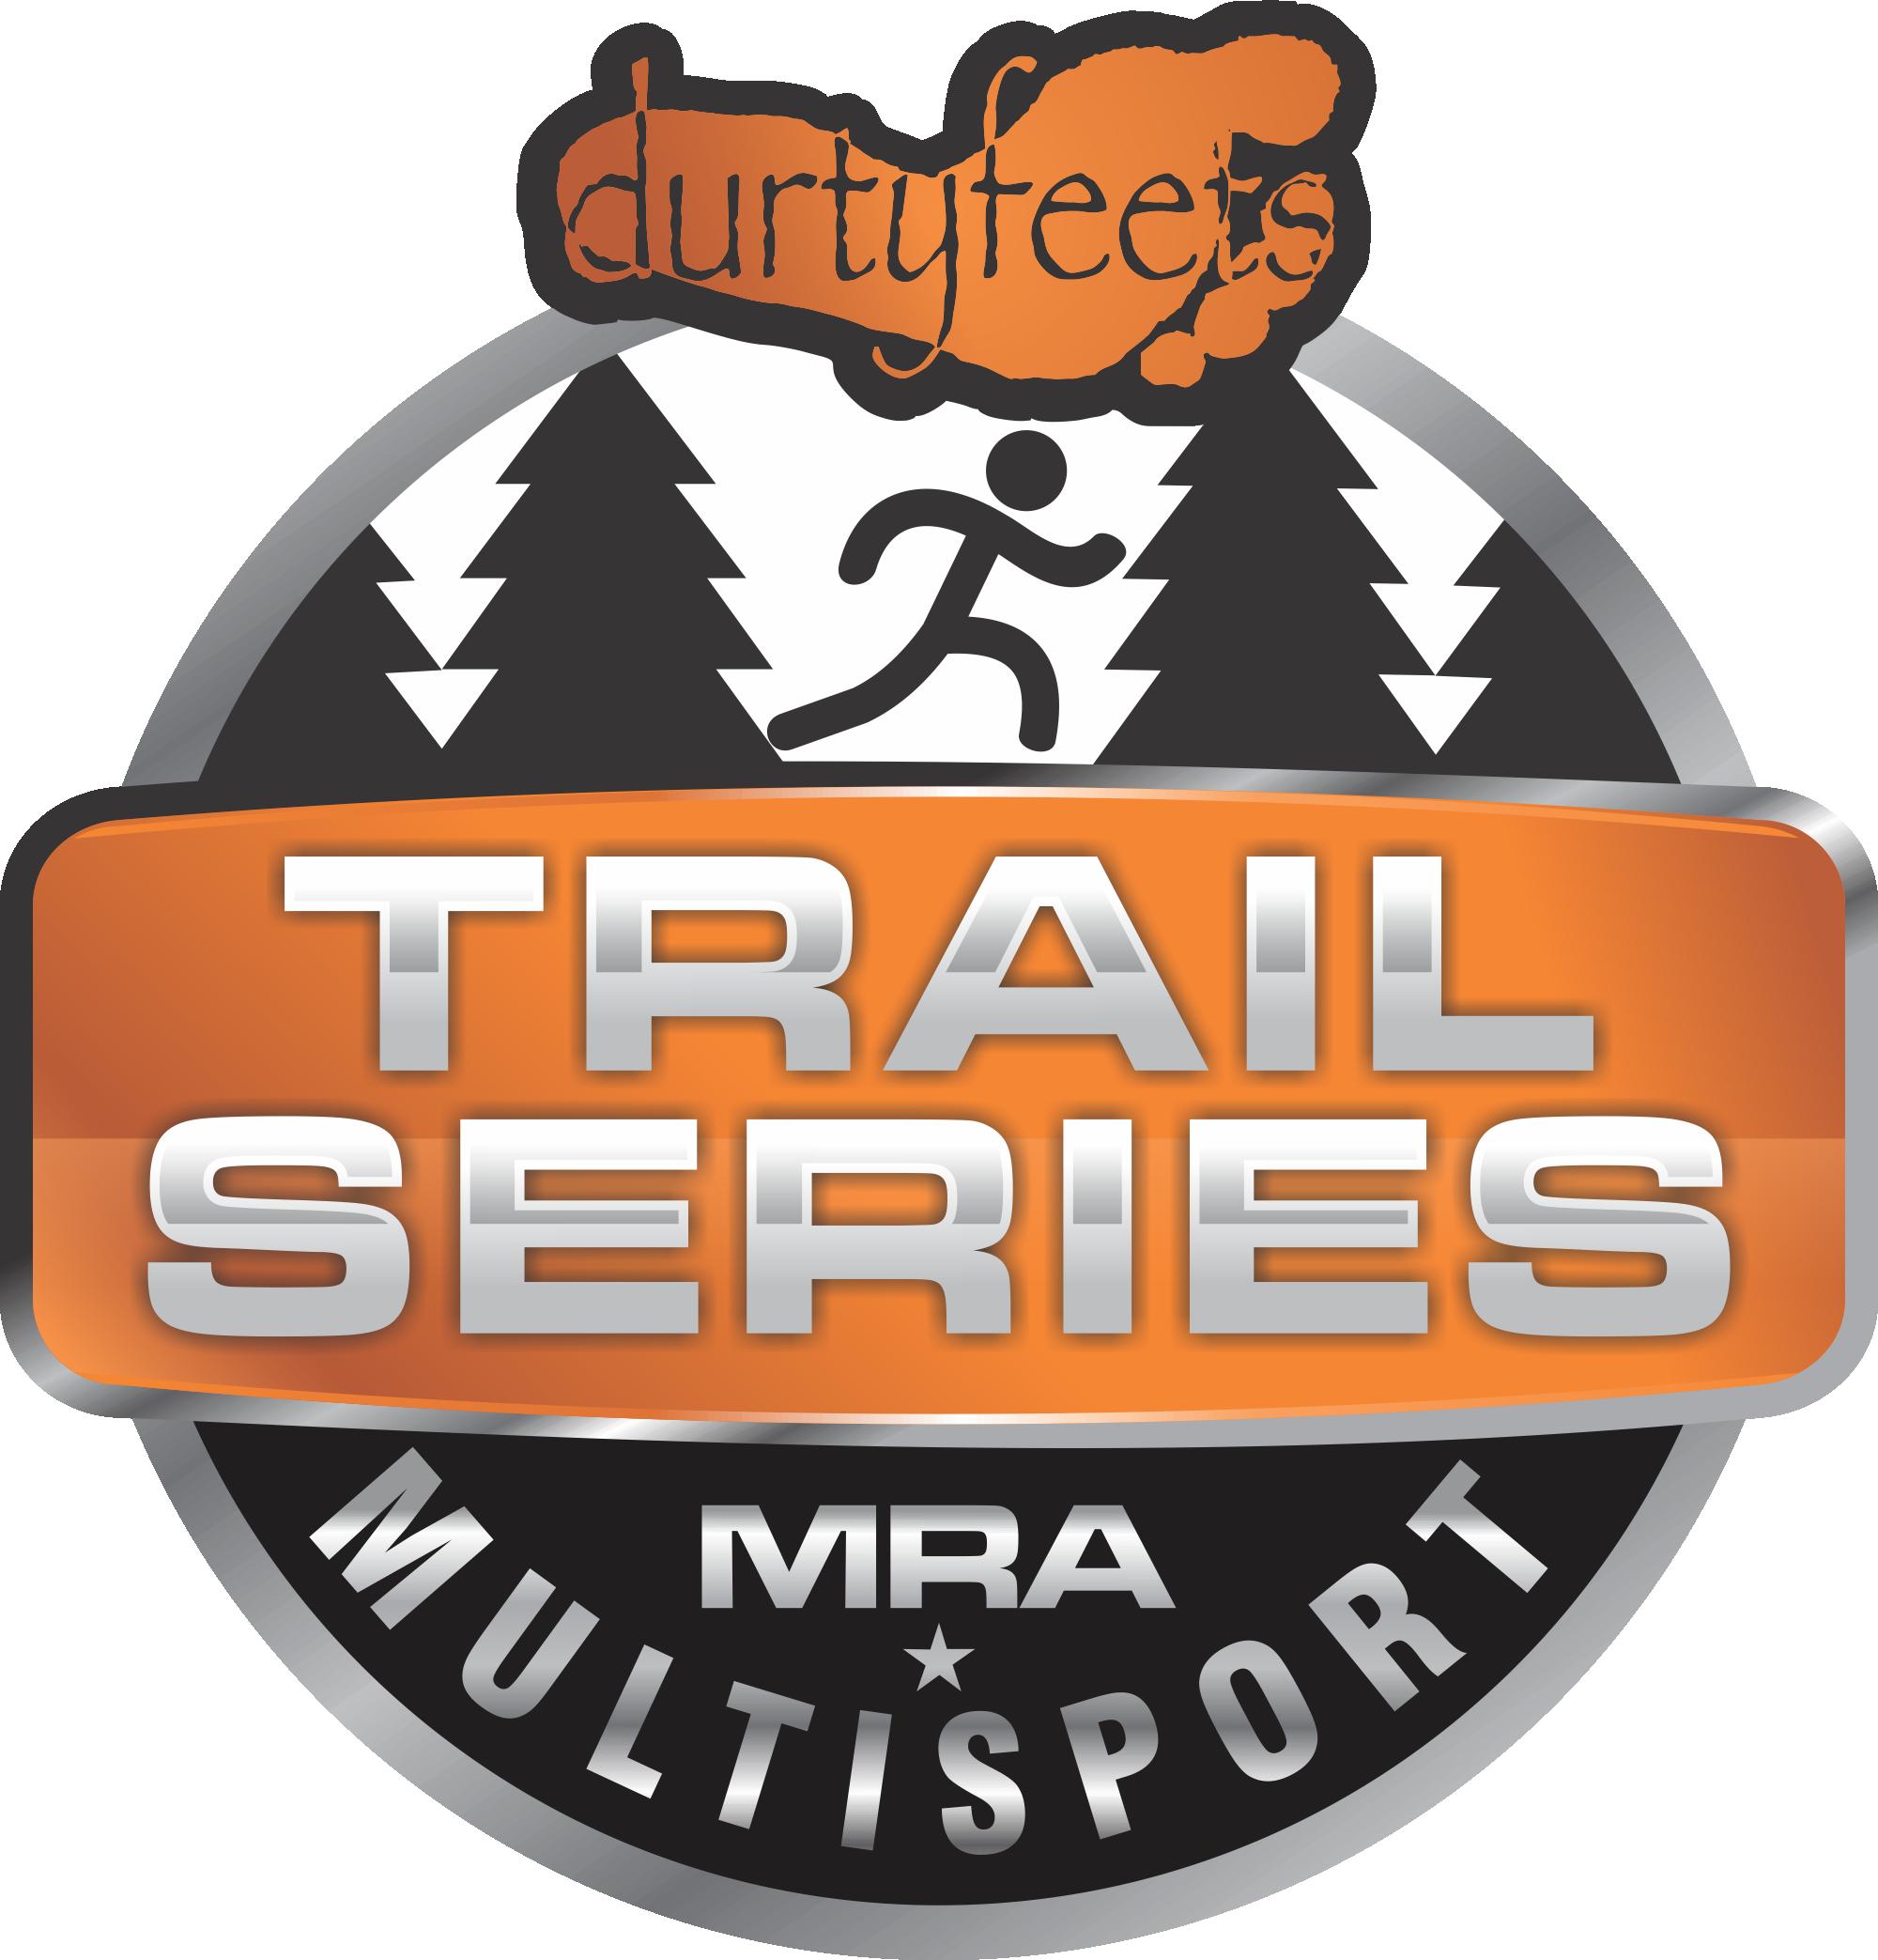 Sponsor durtyfeets Trail Series